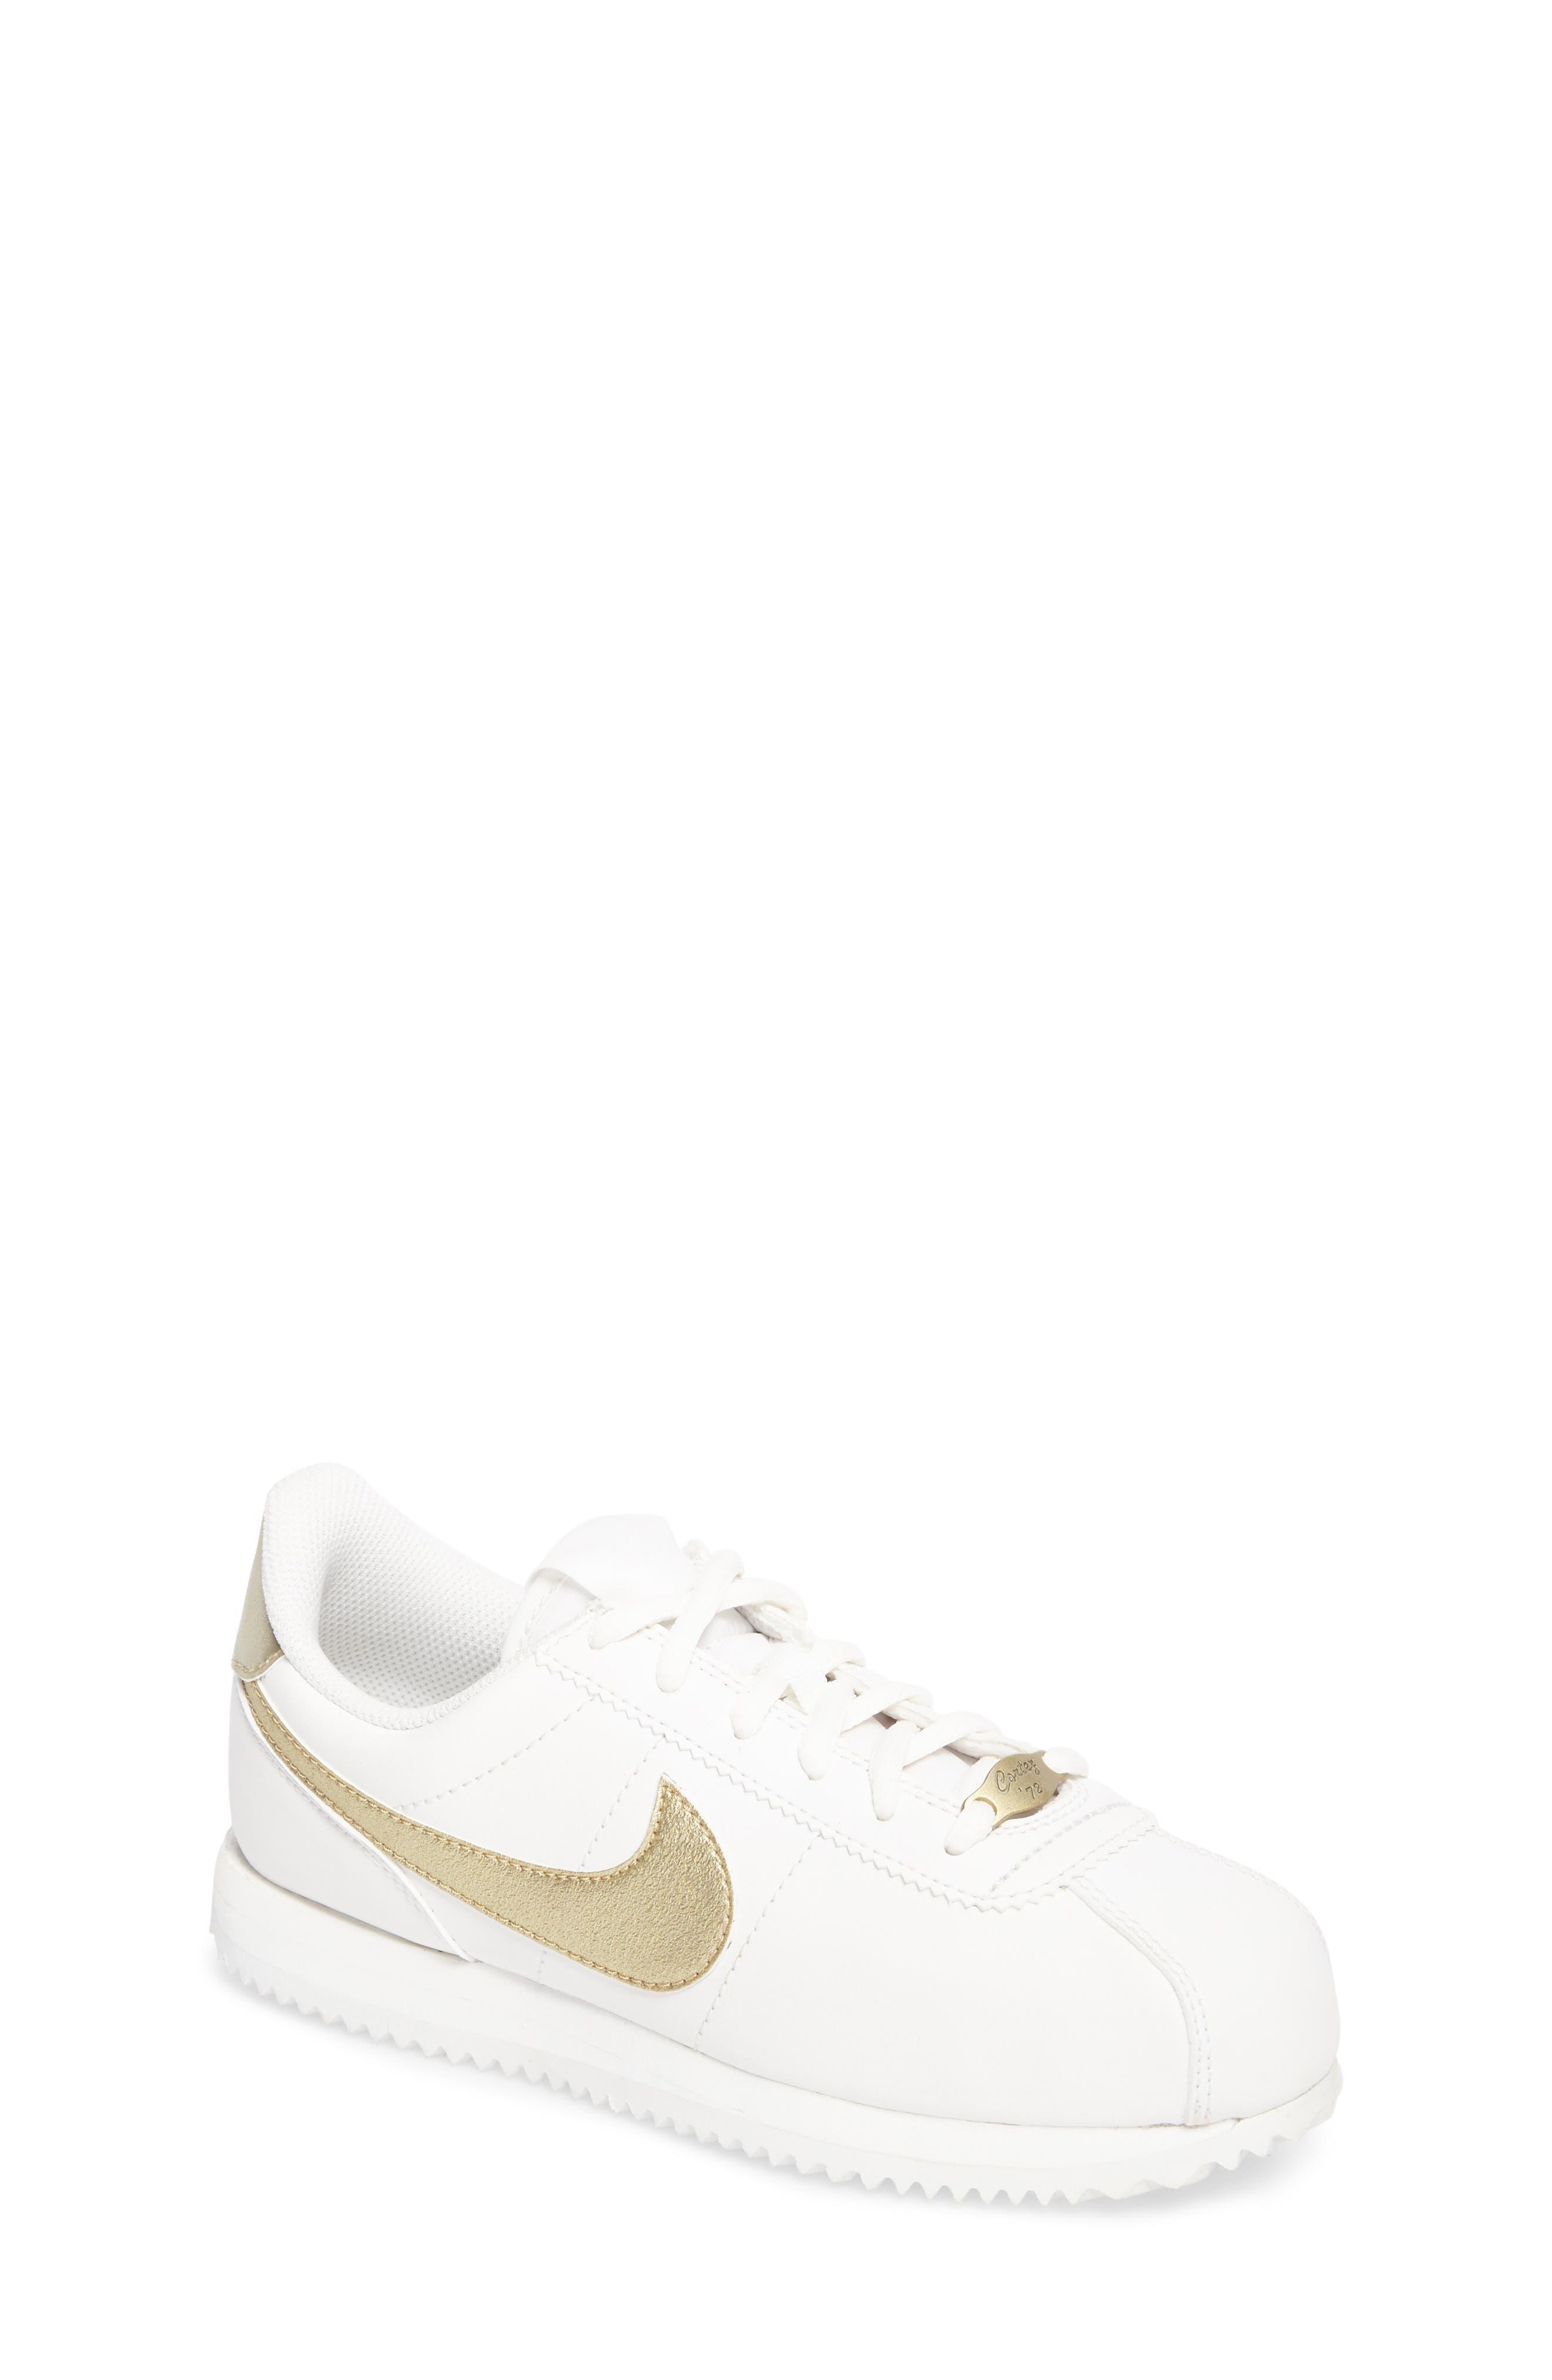 Main Image - Nike Cortez Basic SL Sneaker (Toddler, Little Kid & Big Kid